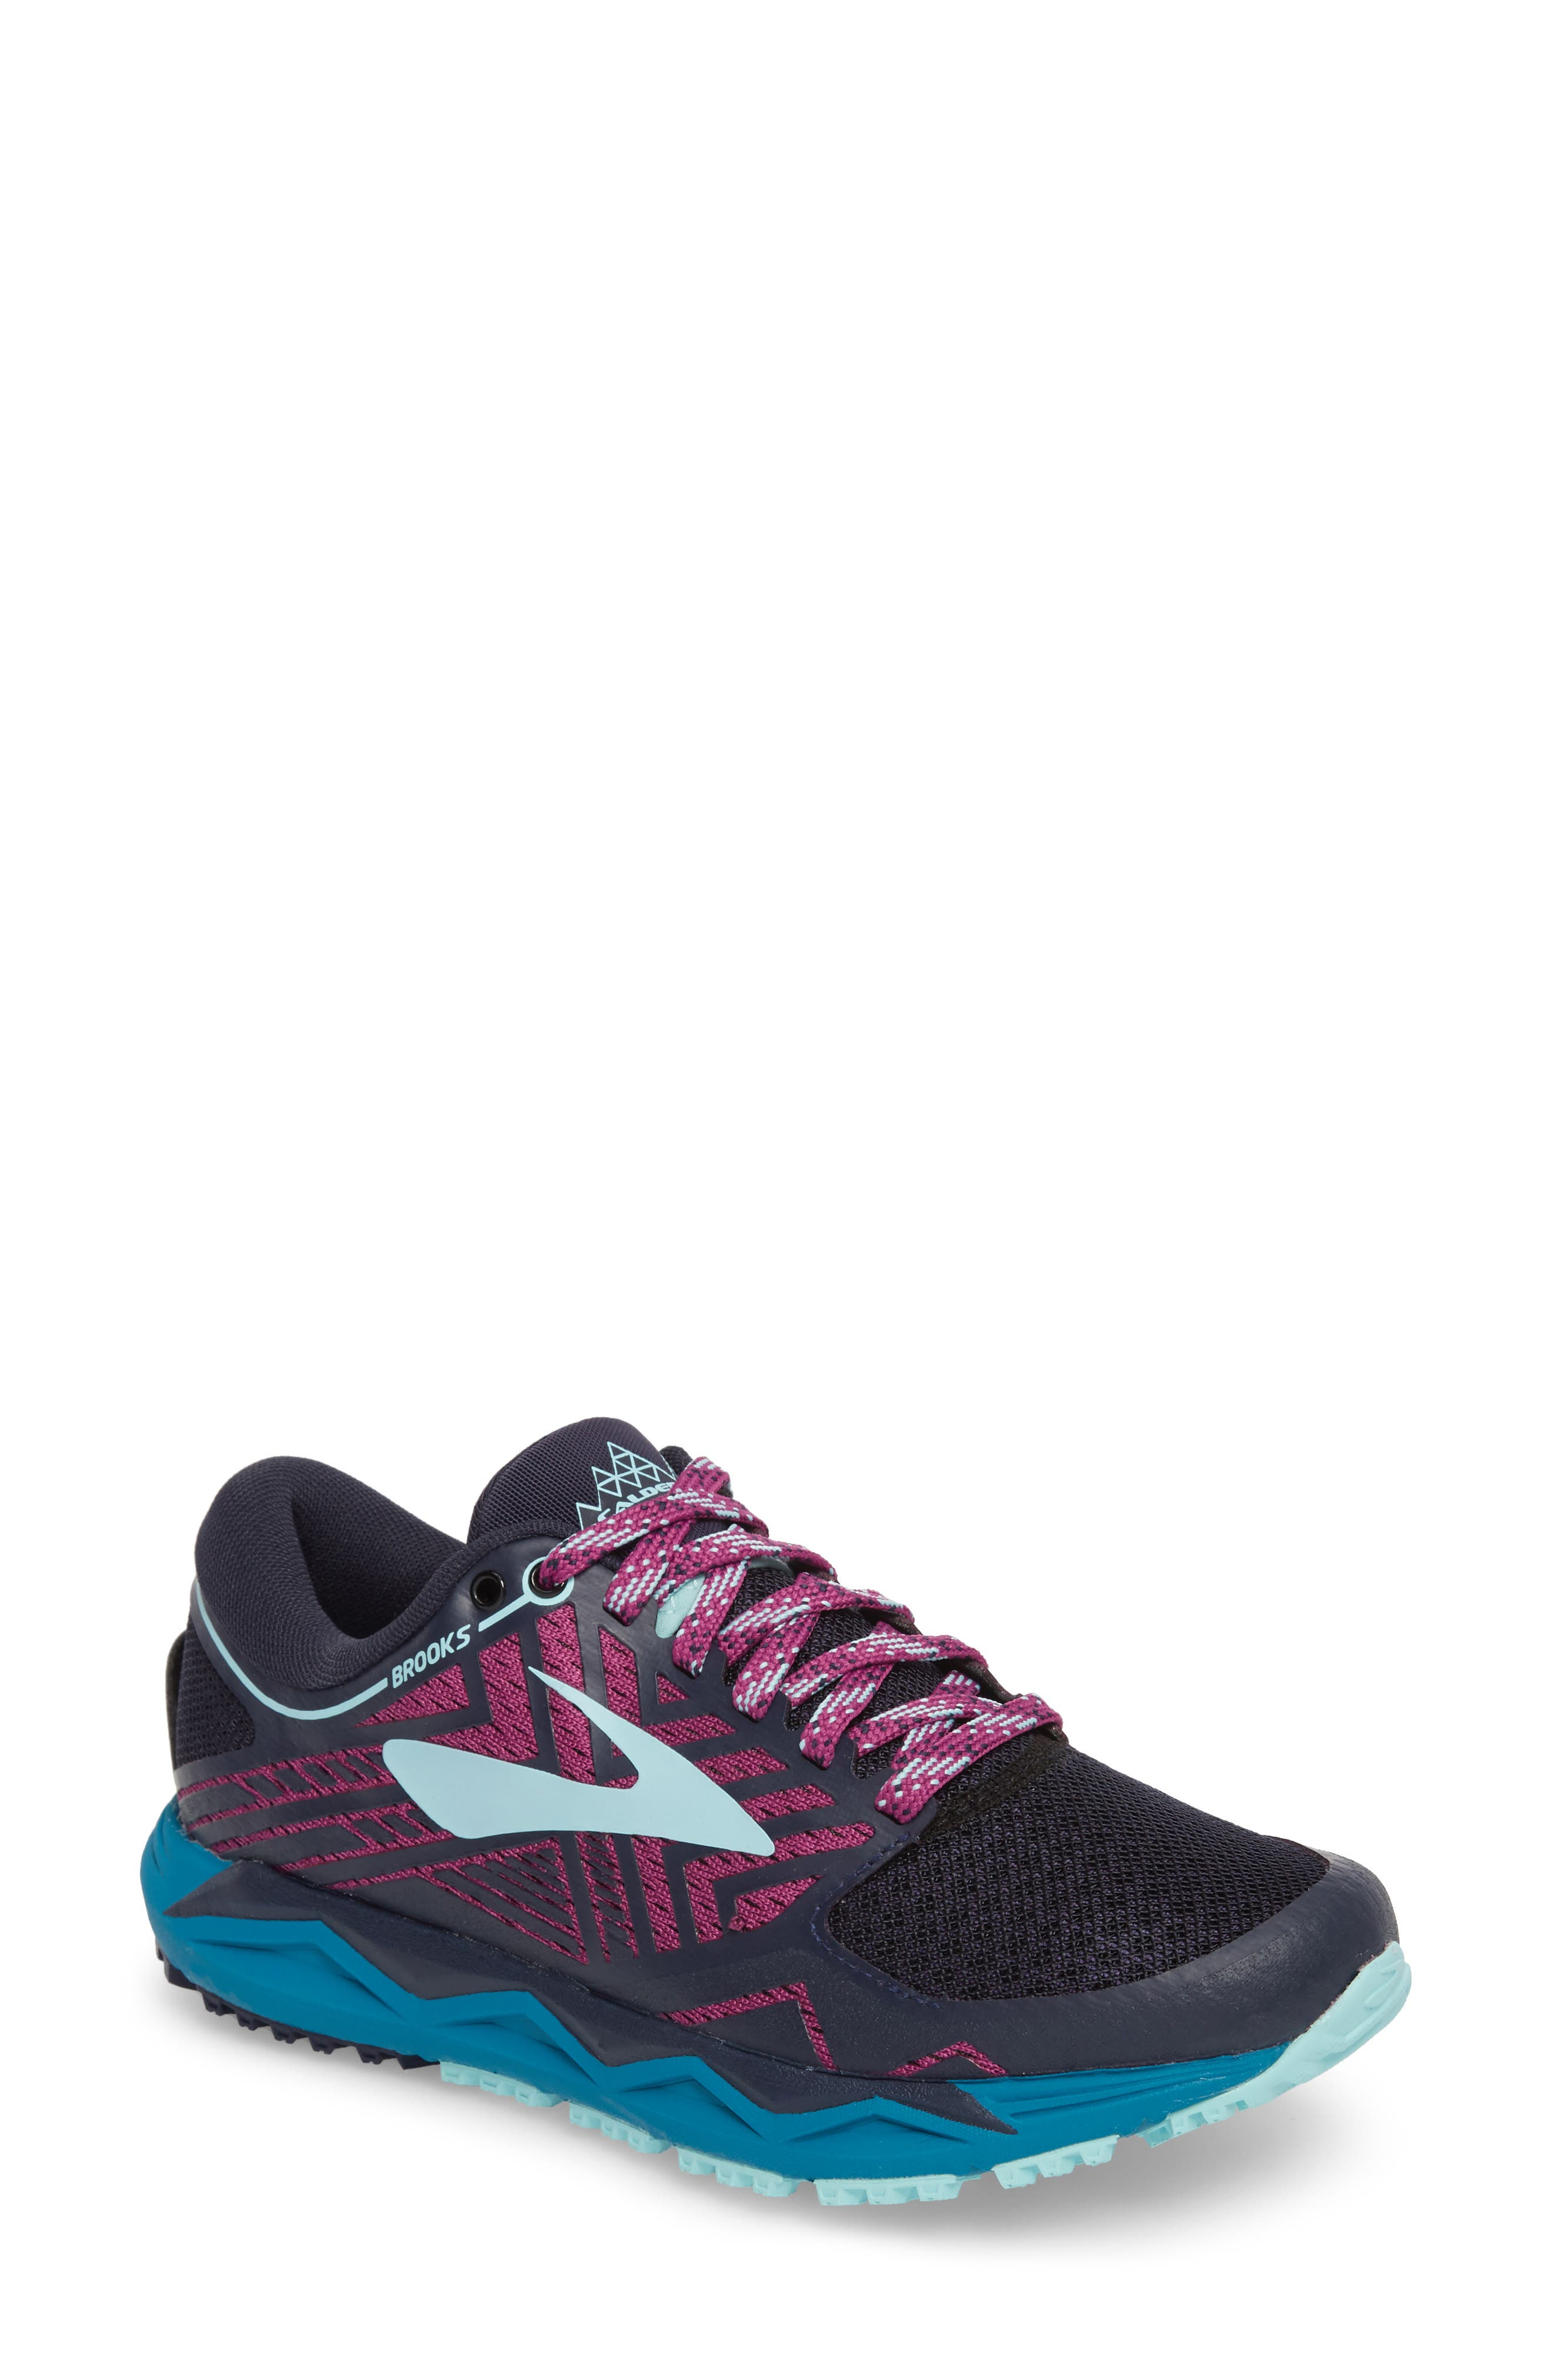 Brooks Caldera 2 Trail Running Shoe, Blue